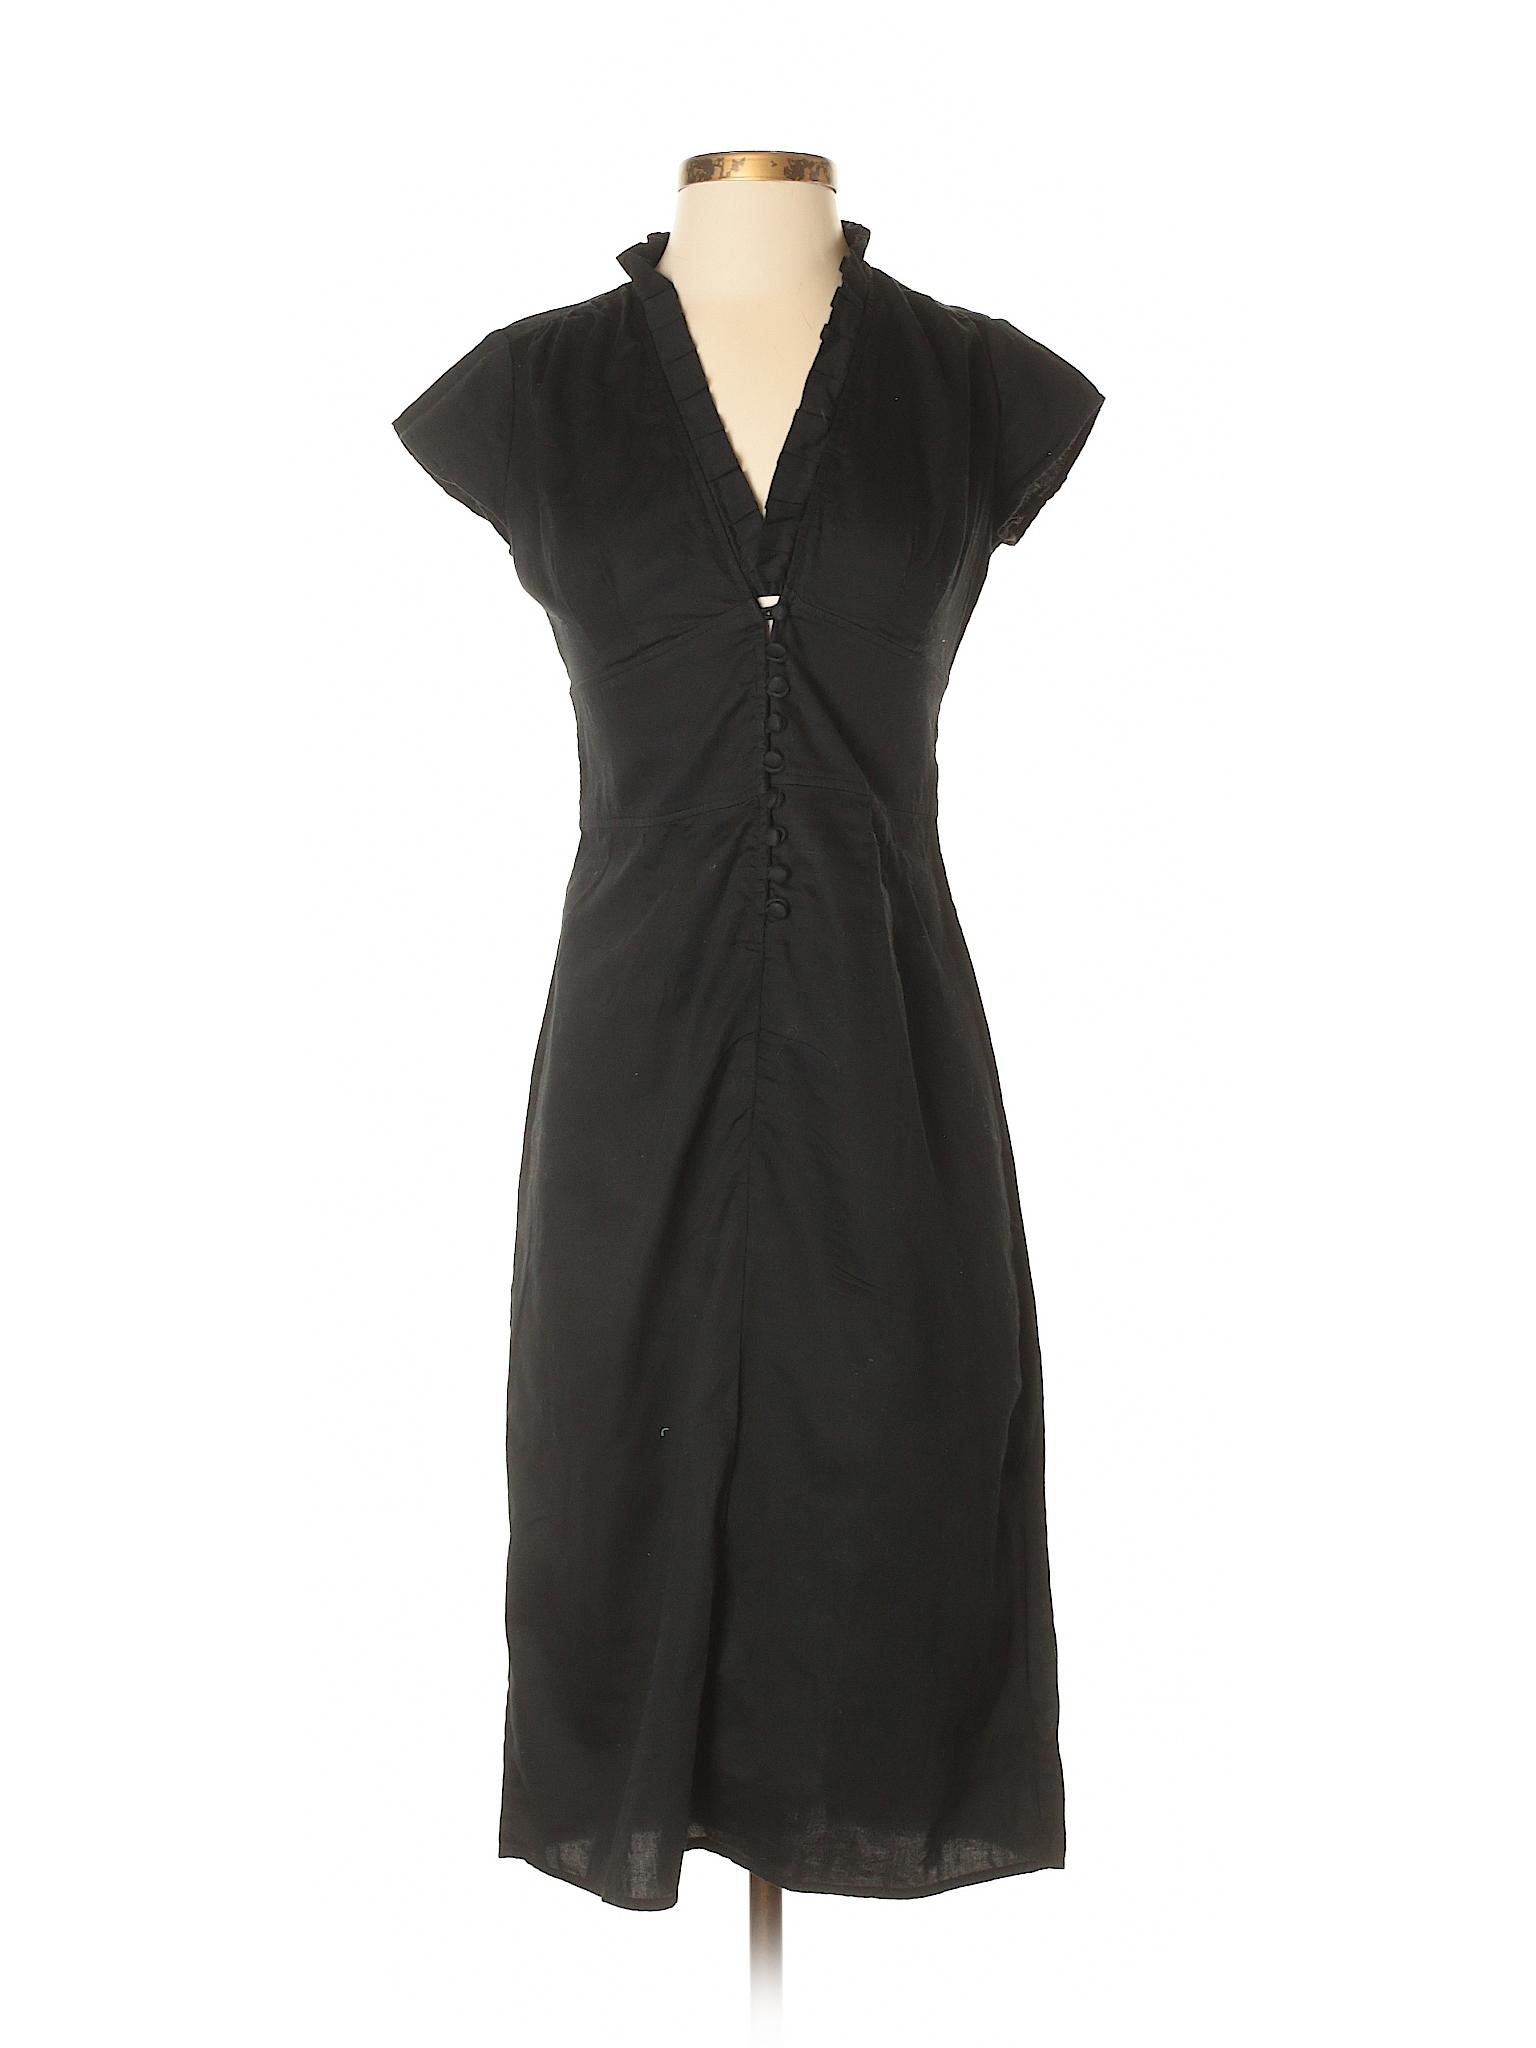 Target for winter Isaac Boutique Dress Mizrahi Casual wtI8qB